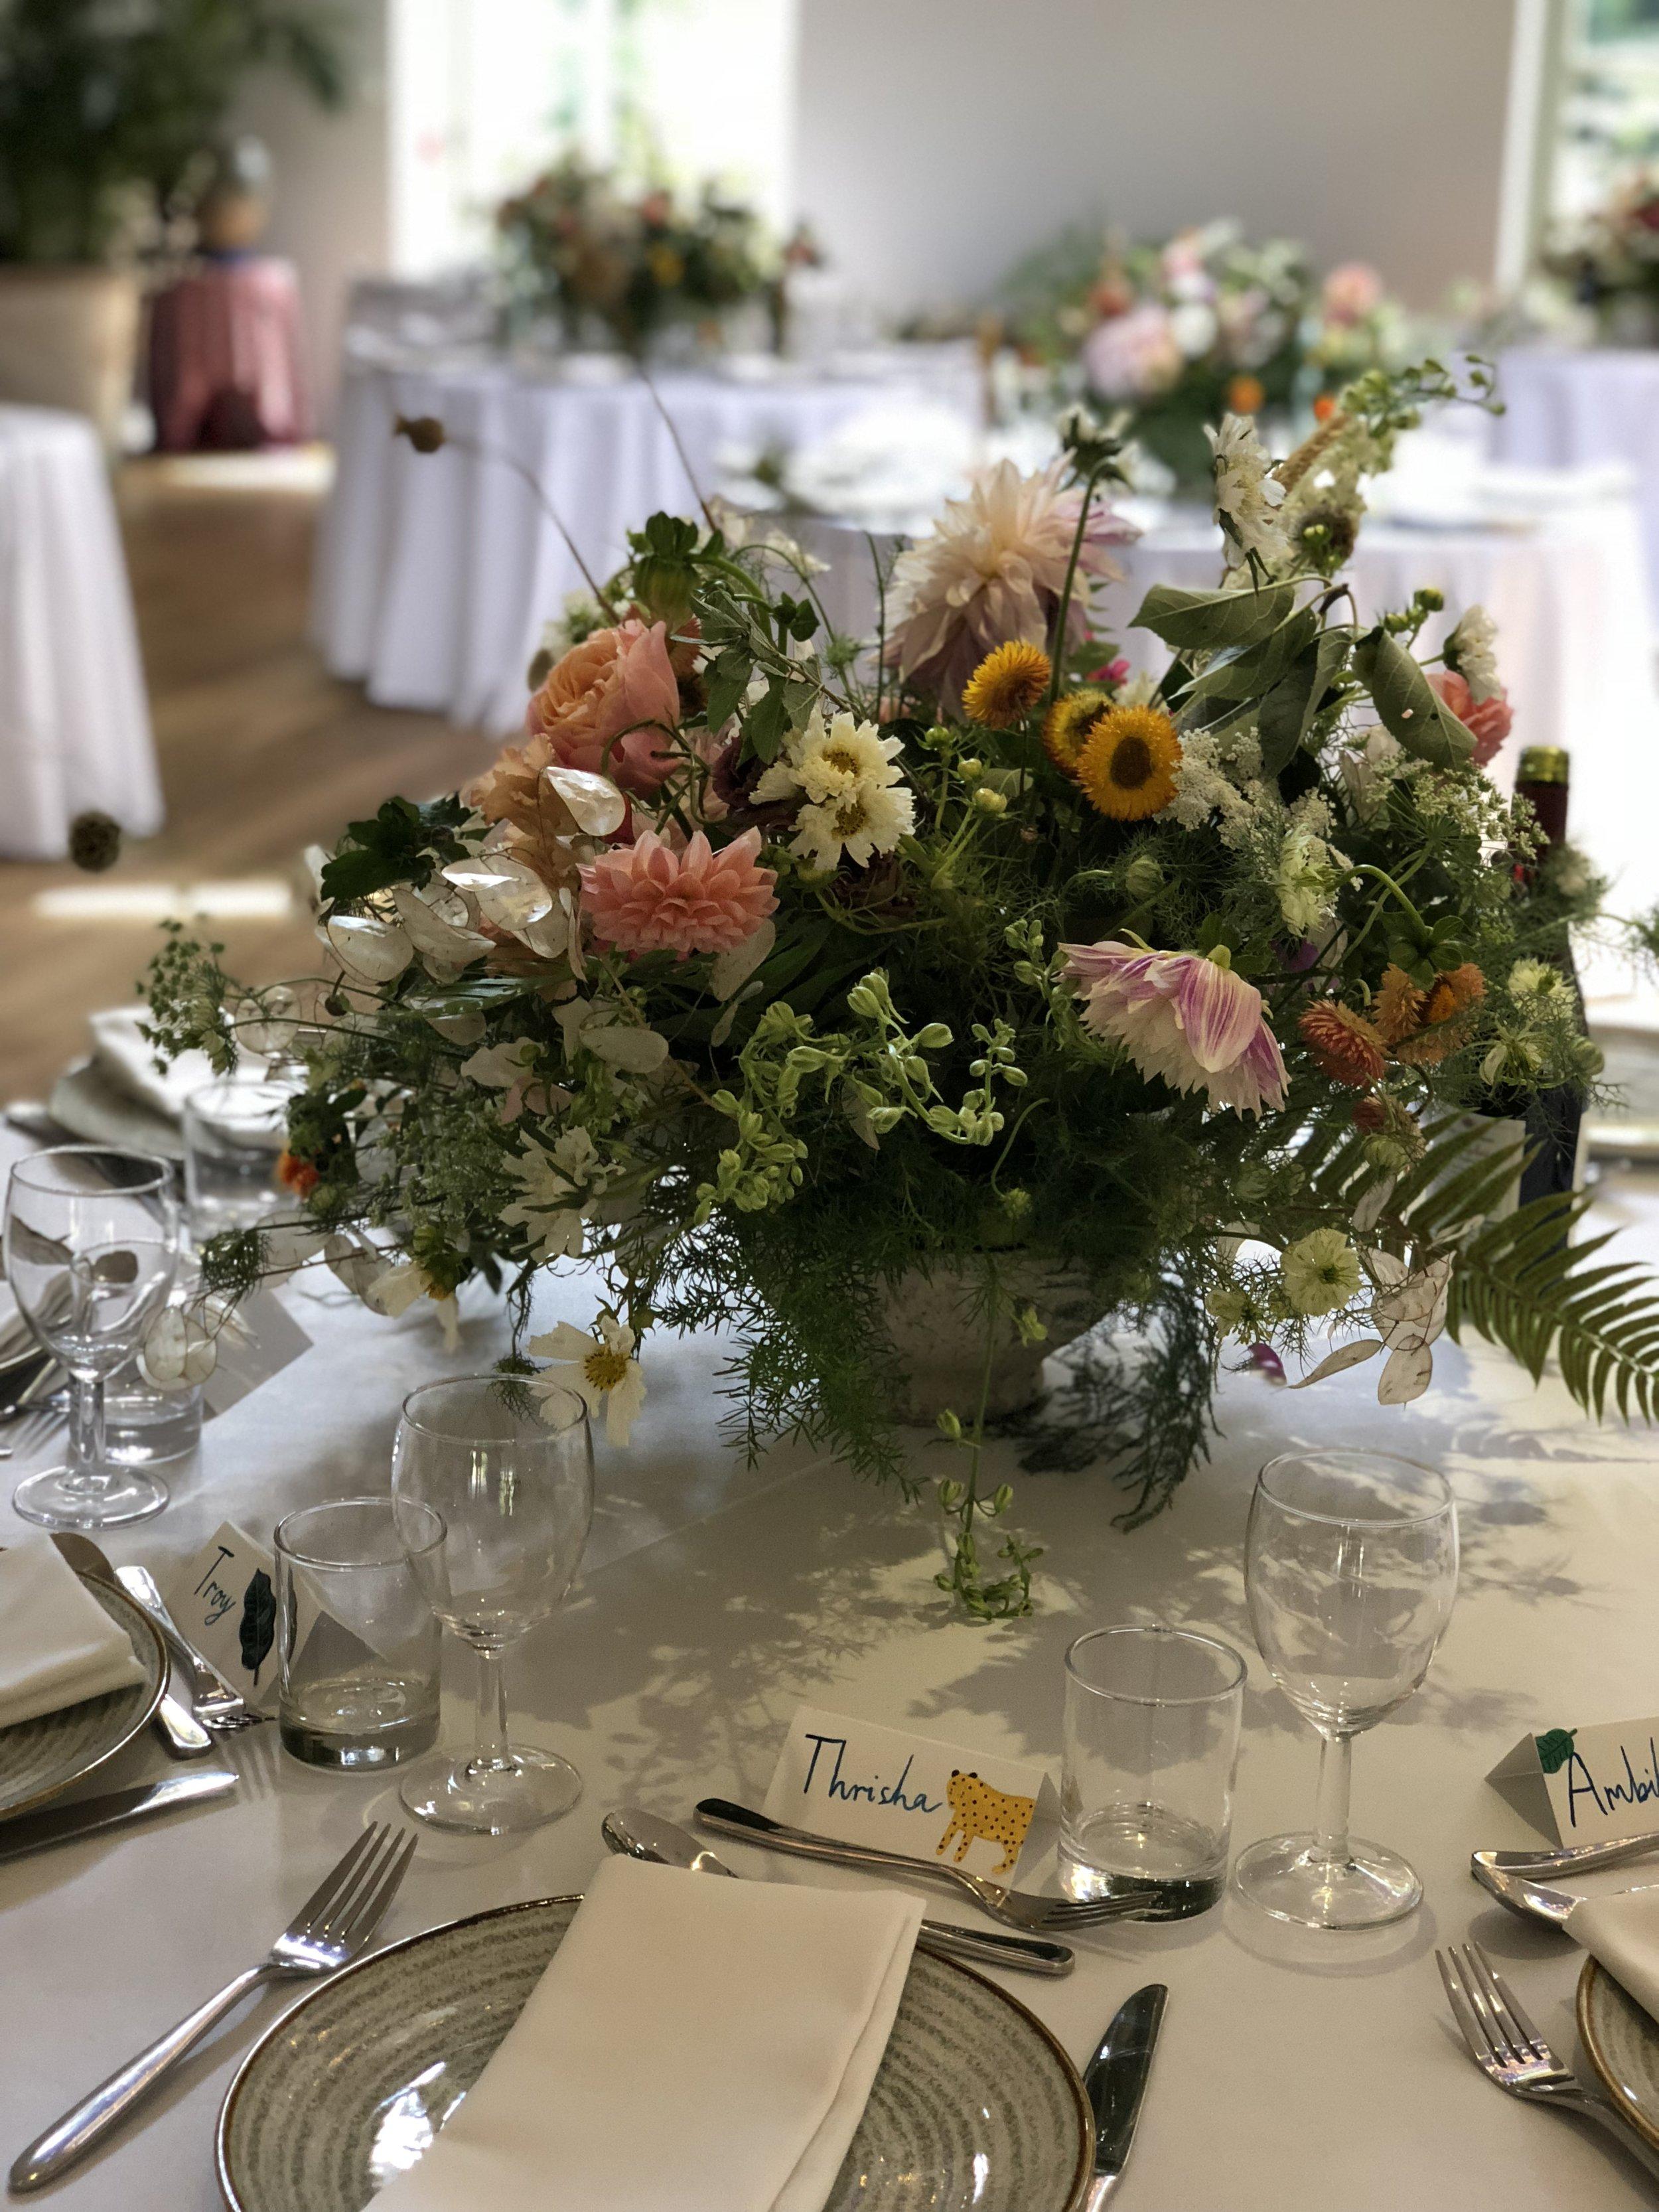 sula bailie wedding table centrepiece